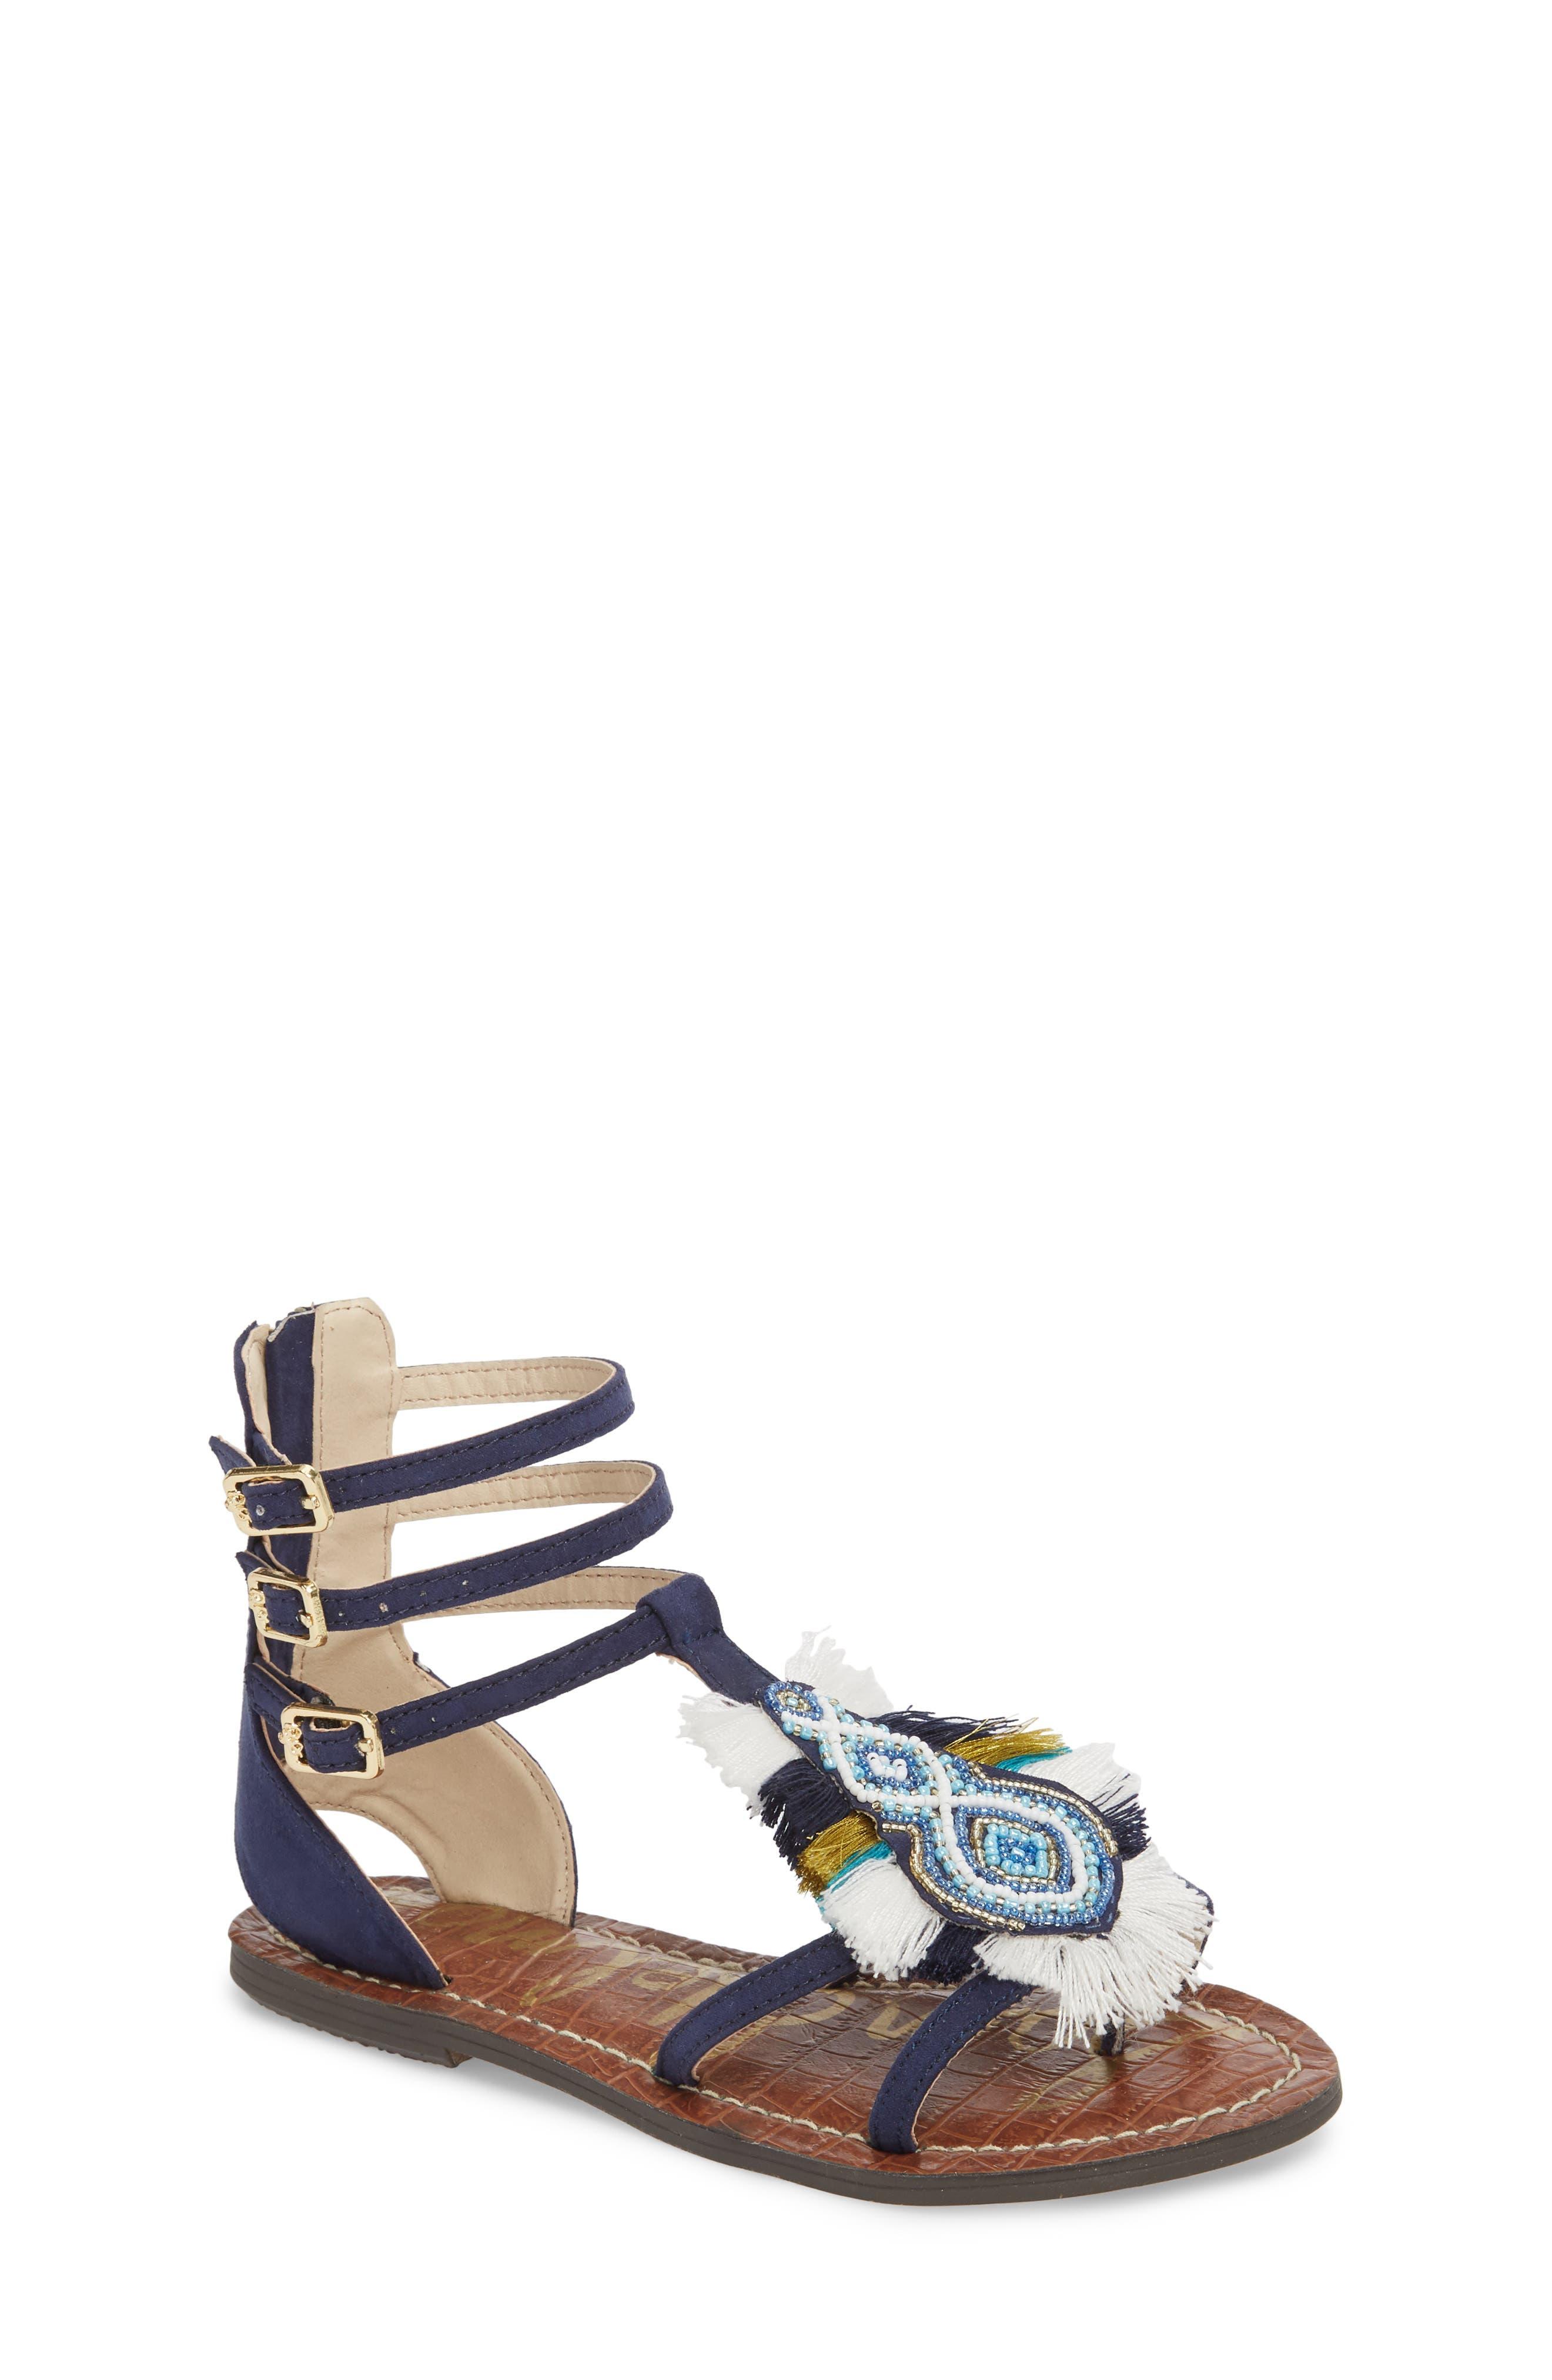 Gigi Giselle Embellished Sandal,                             Main thumbnail 1, color,                             410